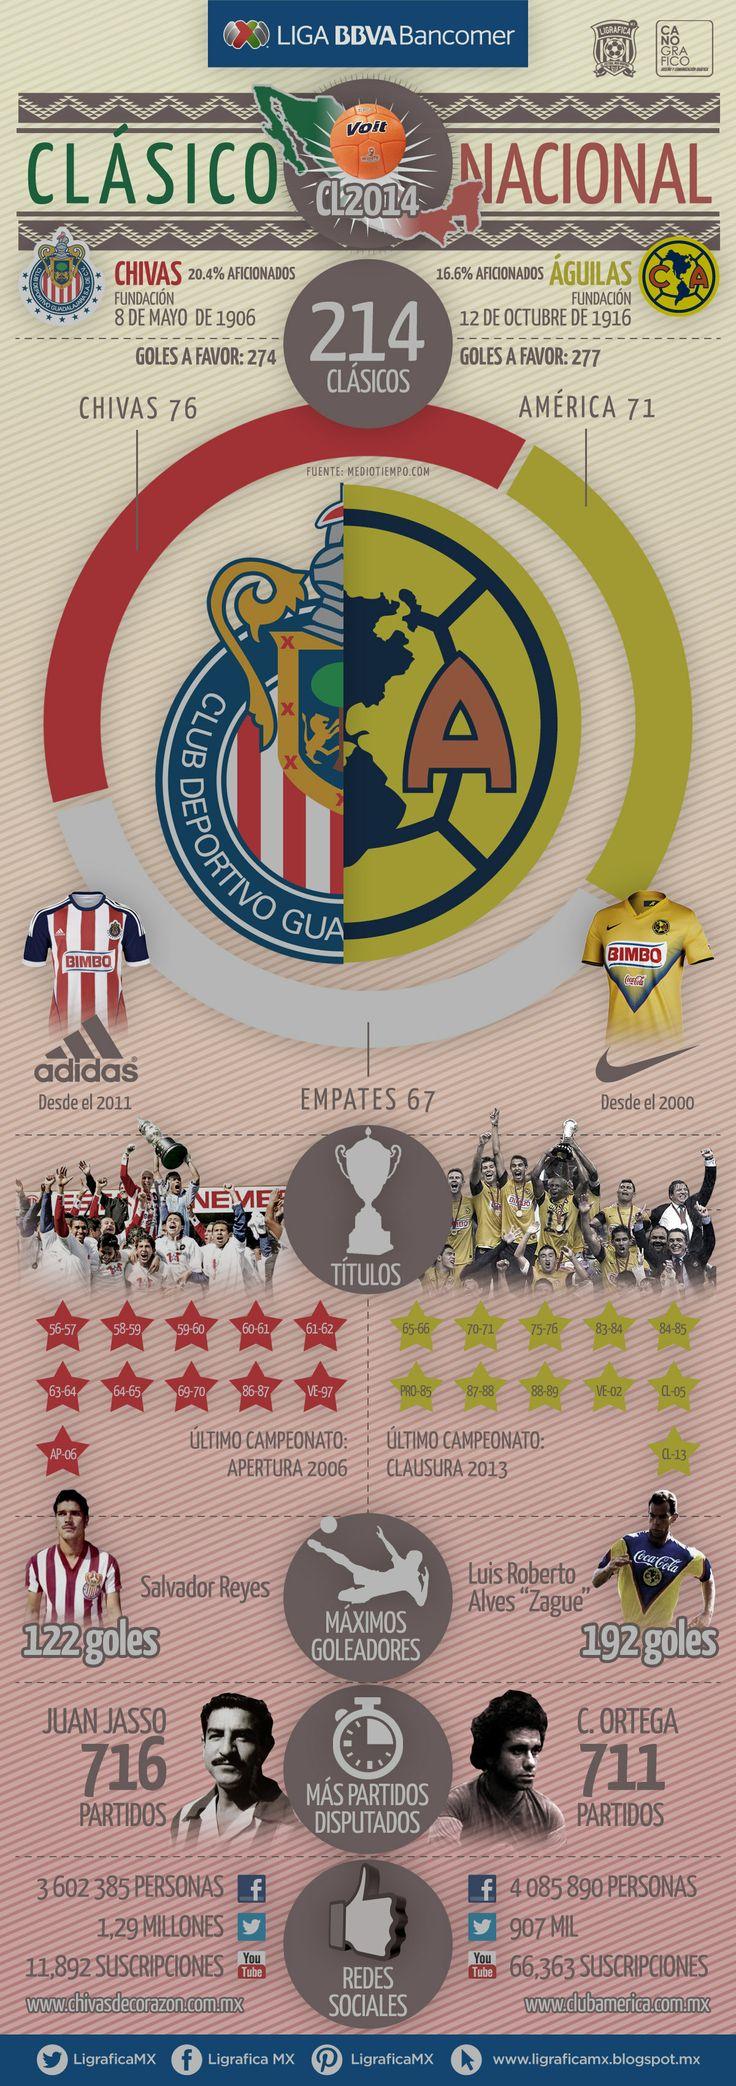 Infografía #ClásicoNacional Chivas VS América • J13/CL14 @Liga Zervena Bancomer MX • LigraficaMX 250314CTG